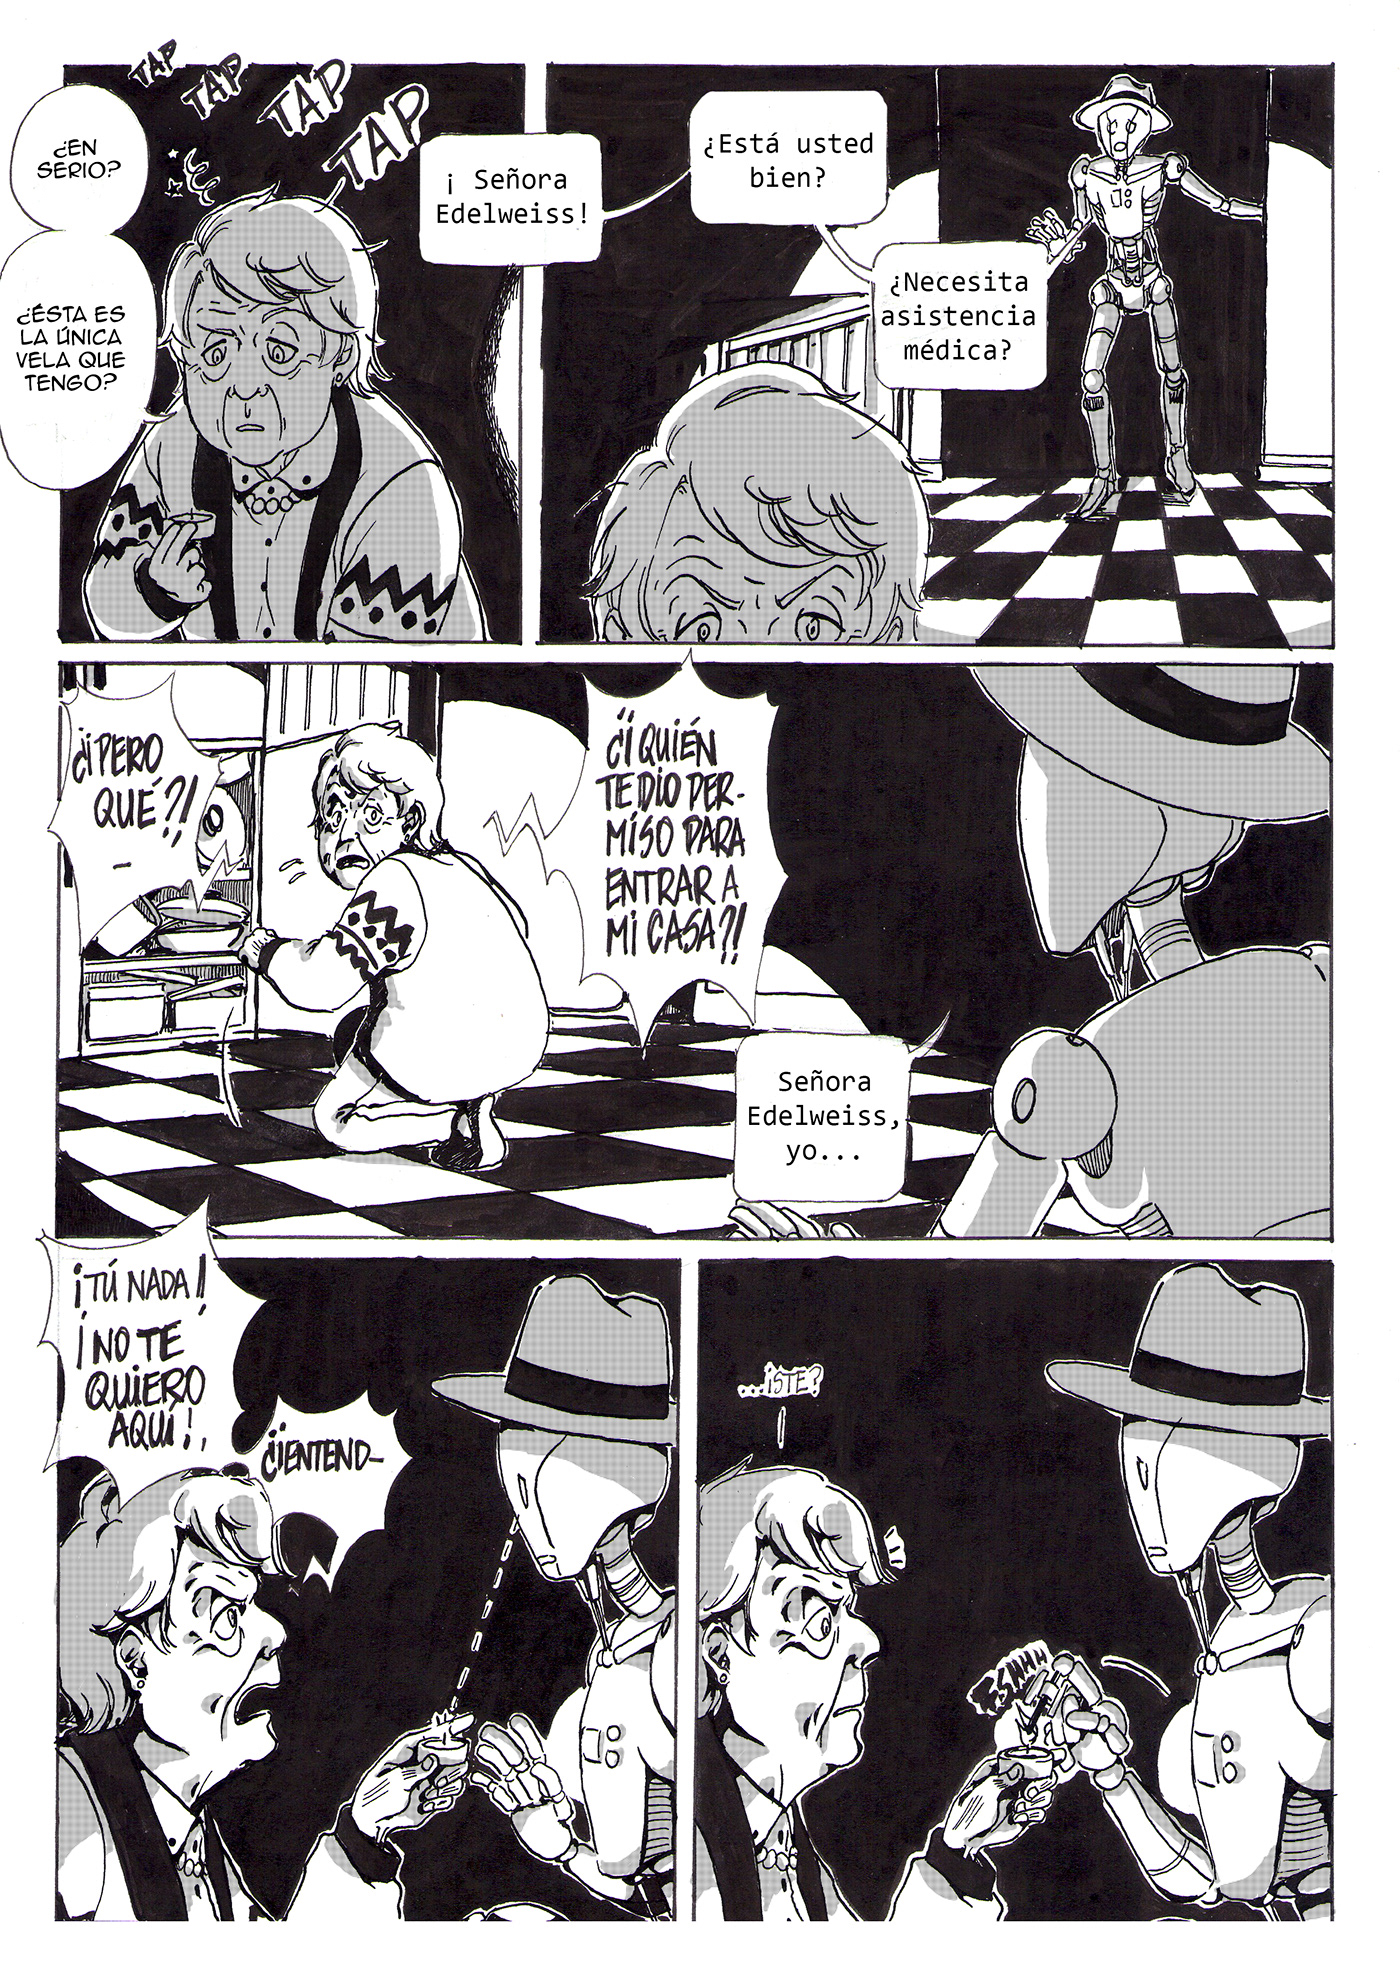 Image may contain: cartoon, book and comic